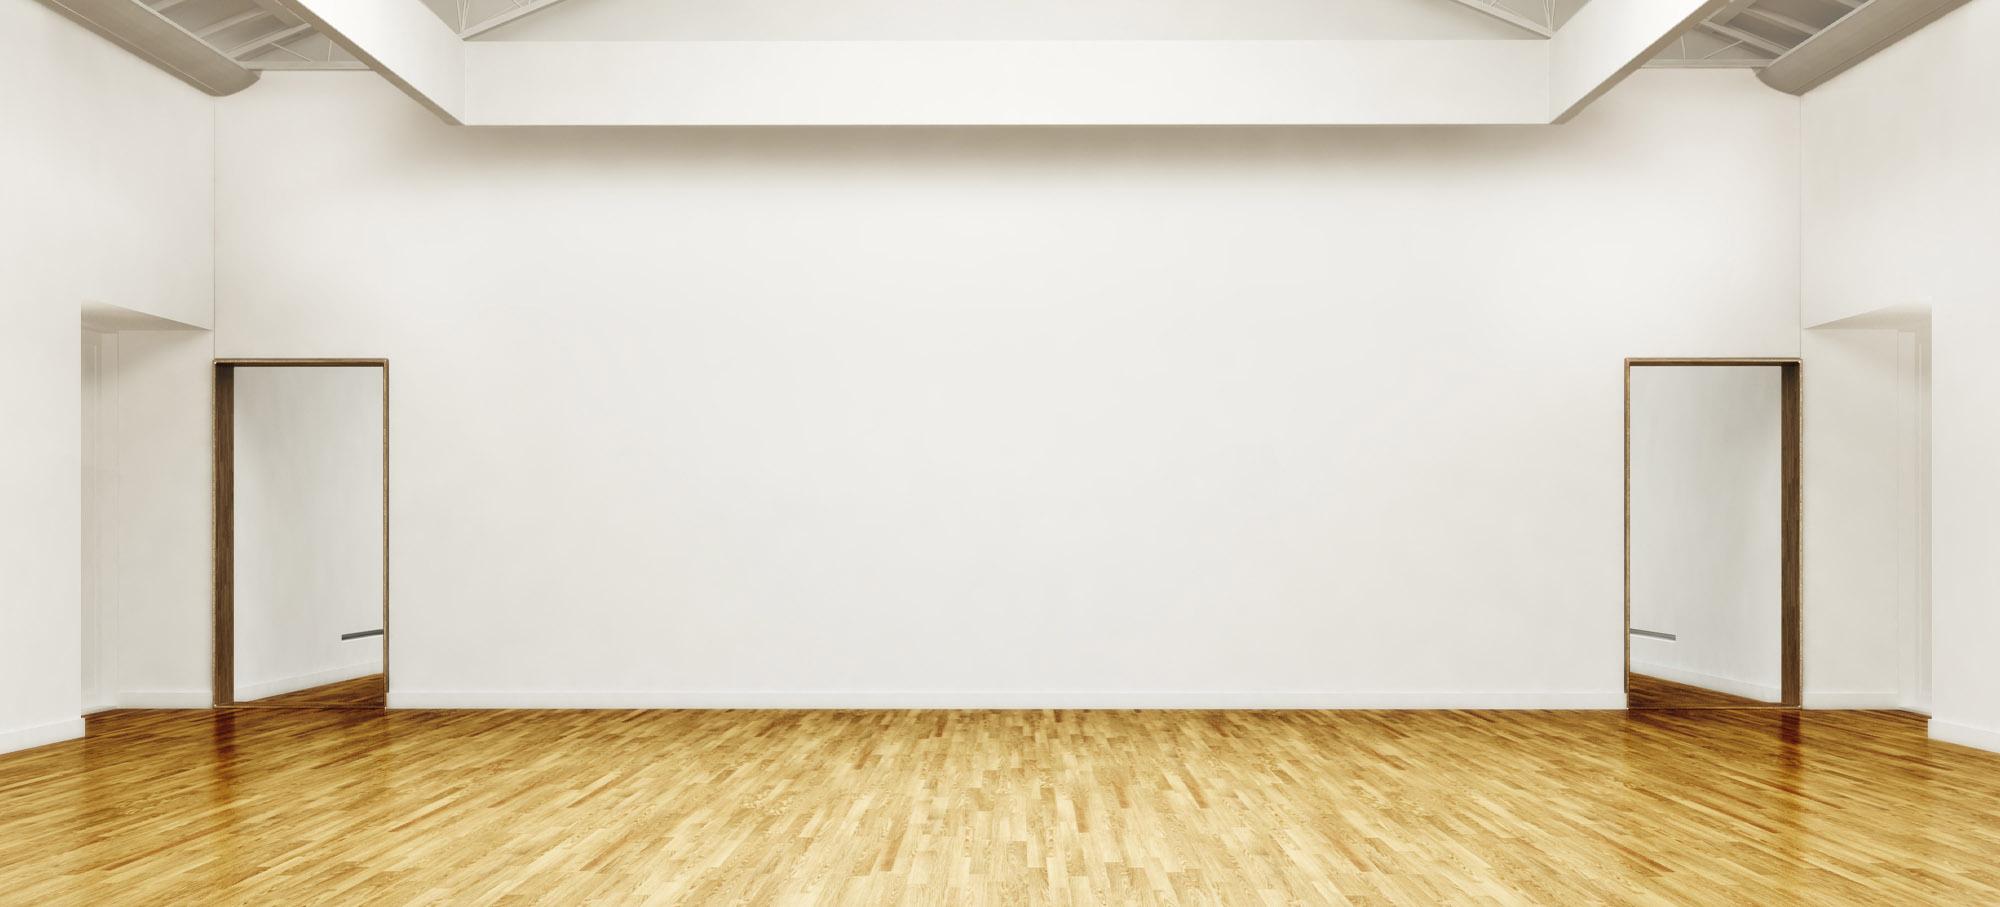 Main Image banner Flooring software